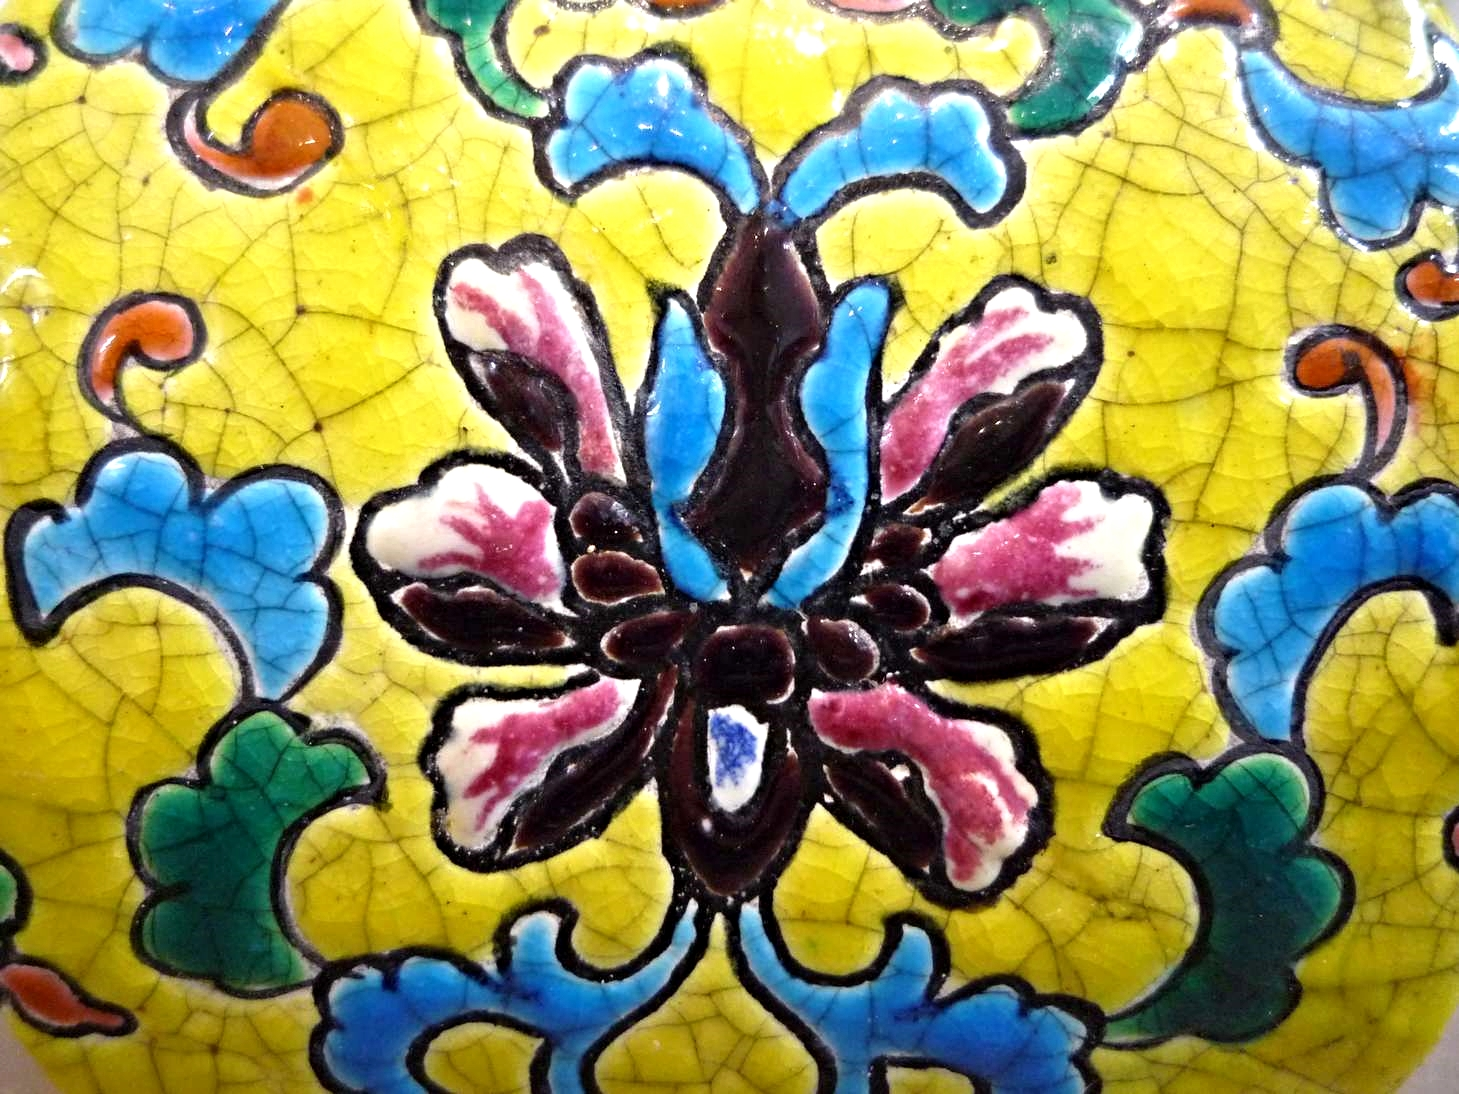 emaux-froid-resine-longwy-faience-art-ceramique-pot-fleurs-restauration-restaurarte.jpg